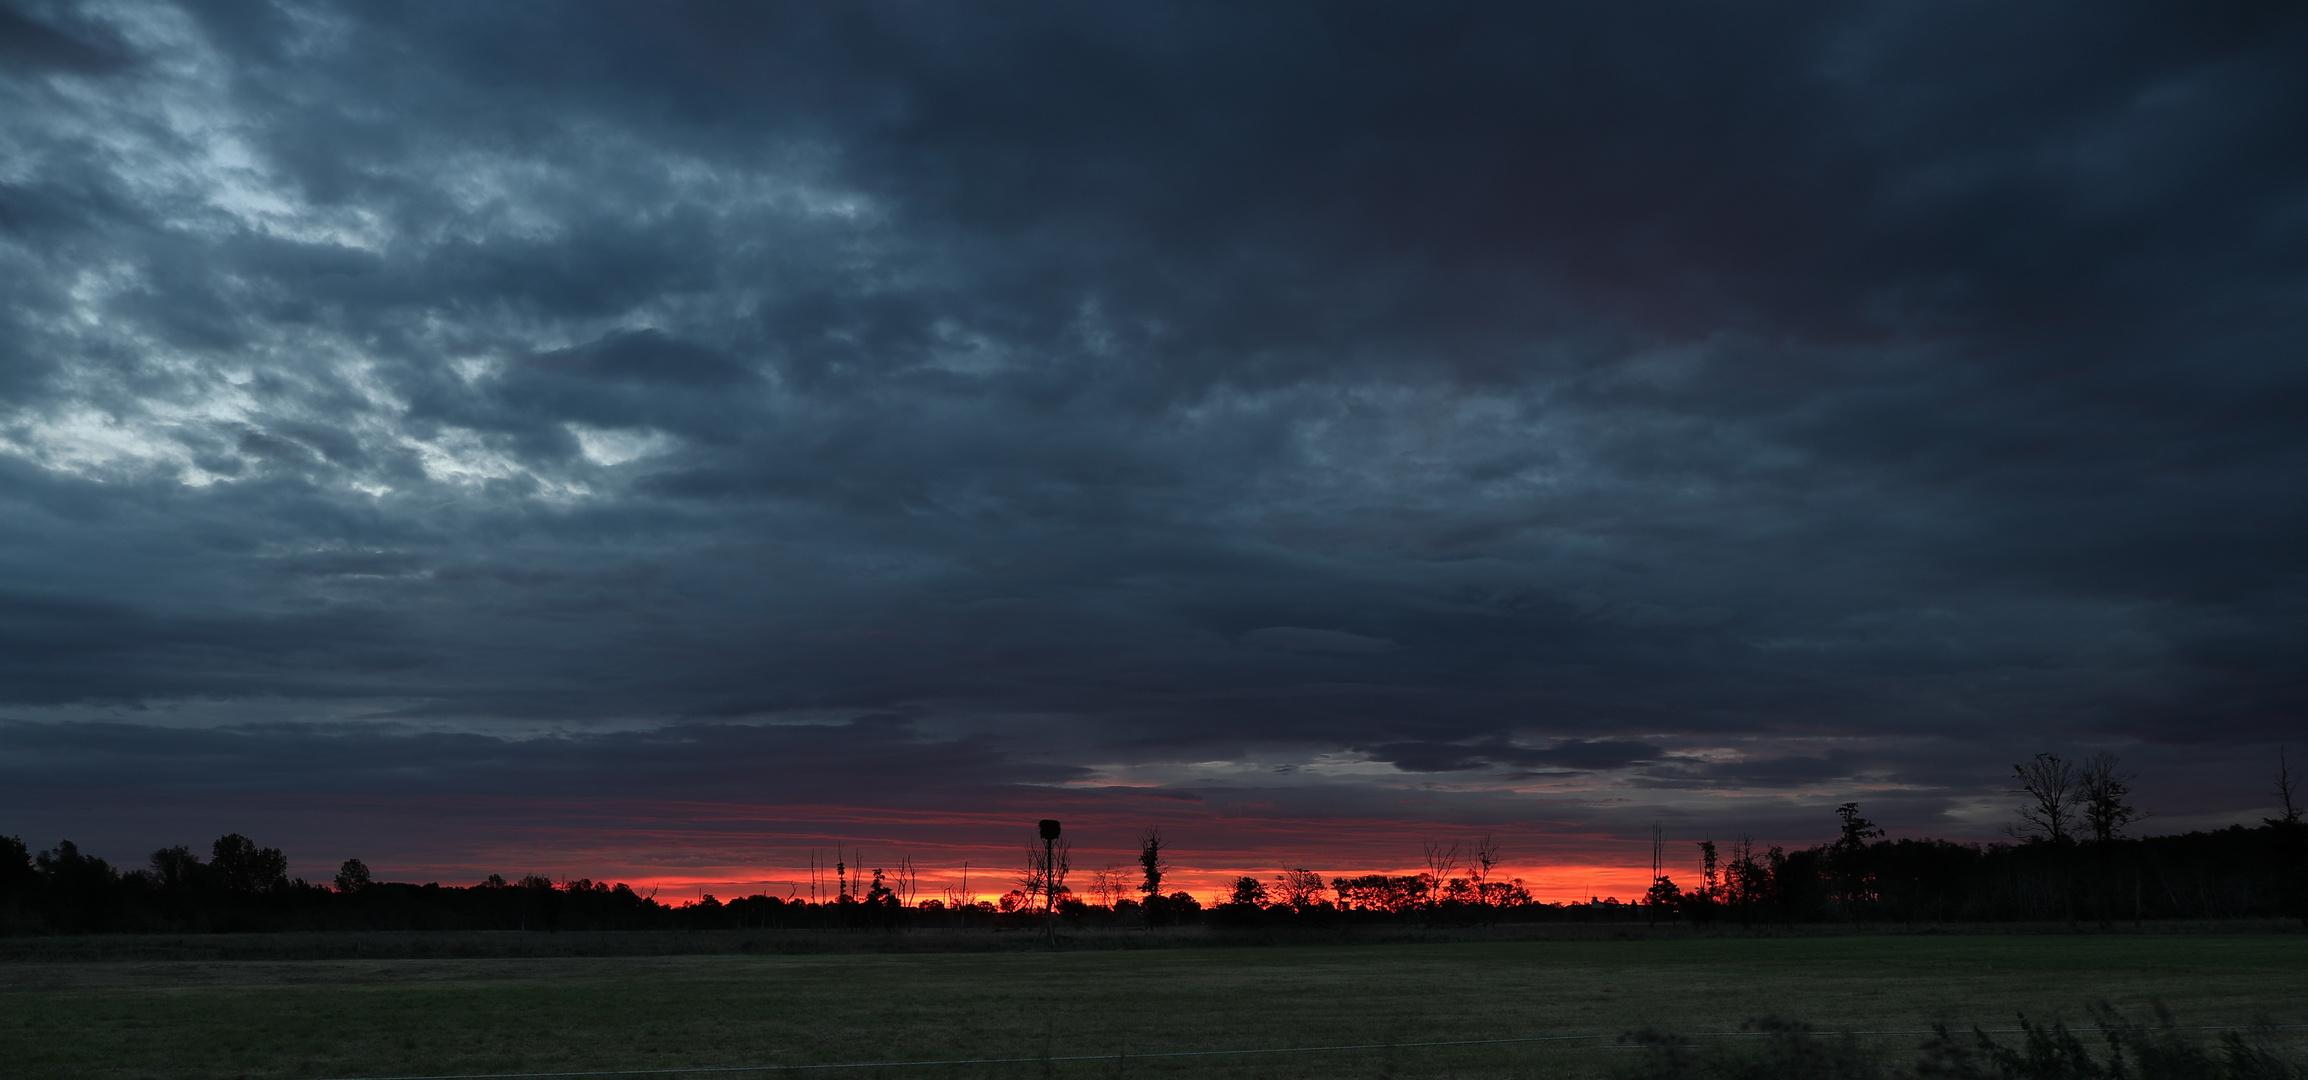 sunrise Ilkerbruch  - 24mm -